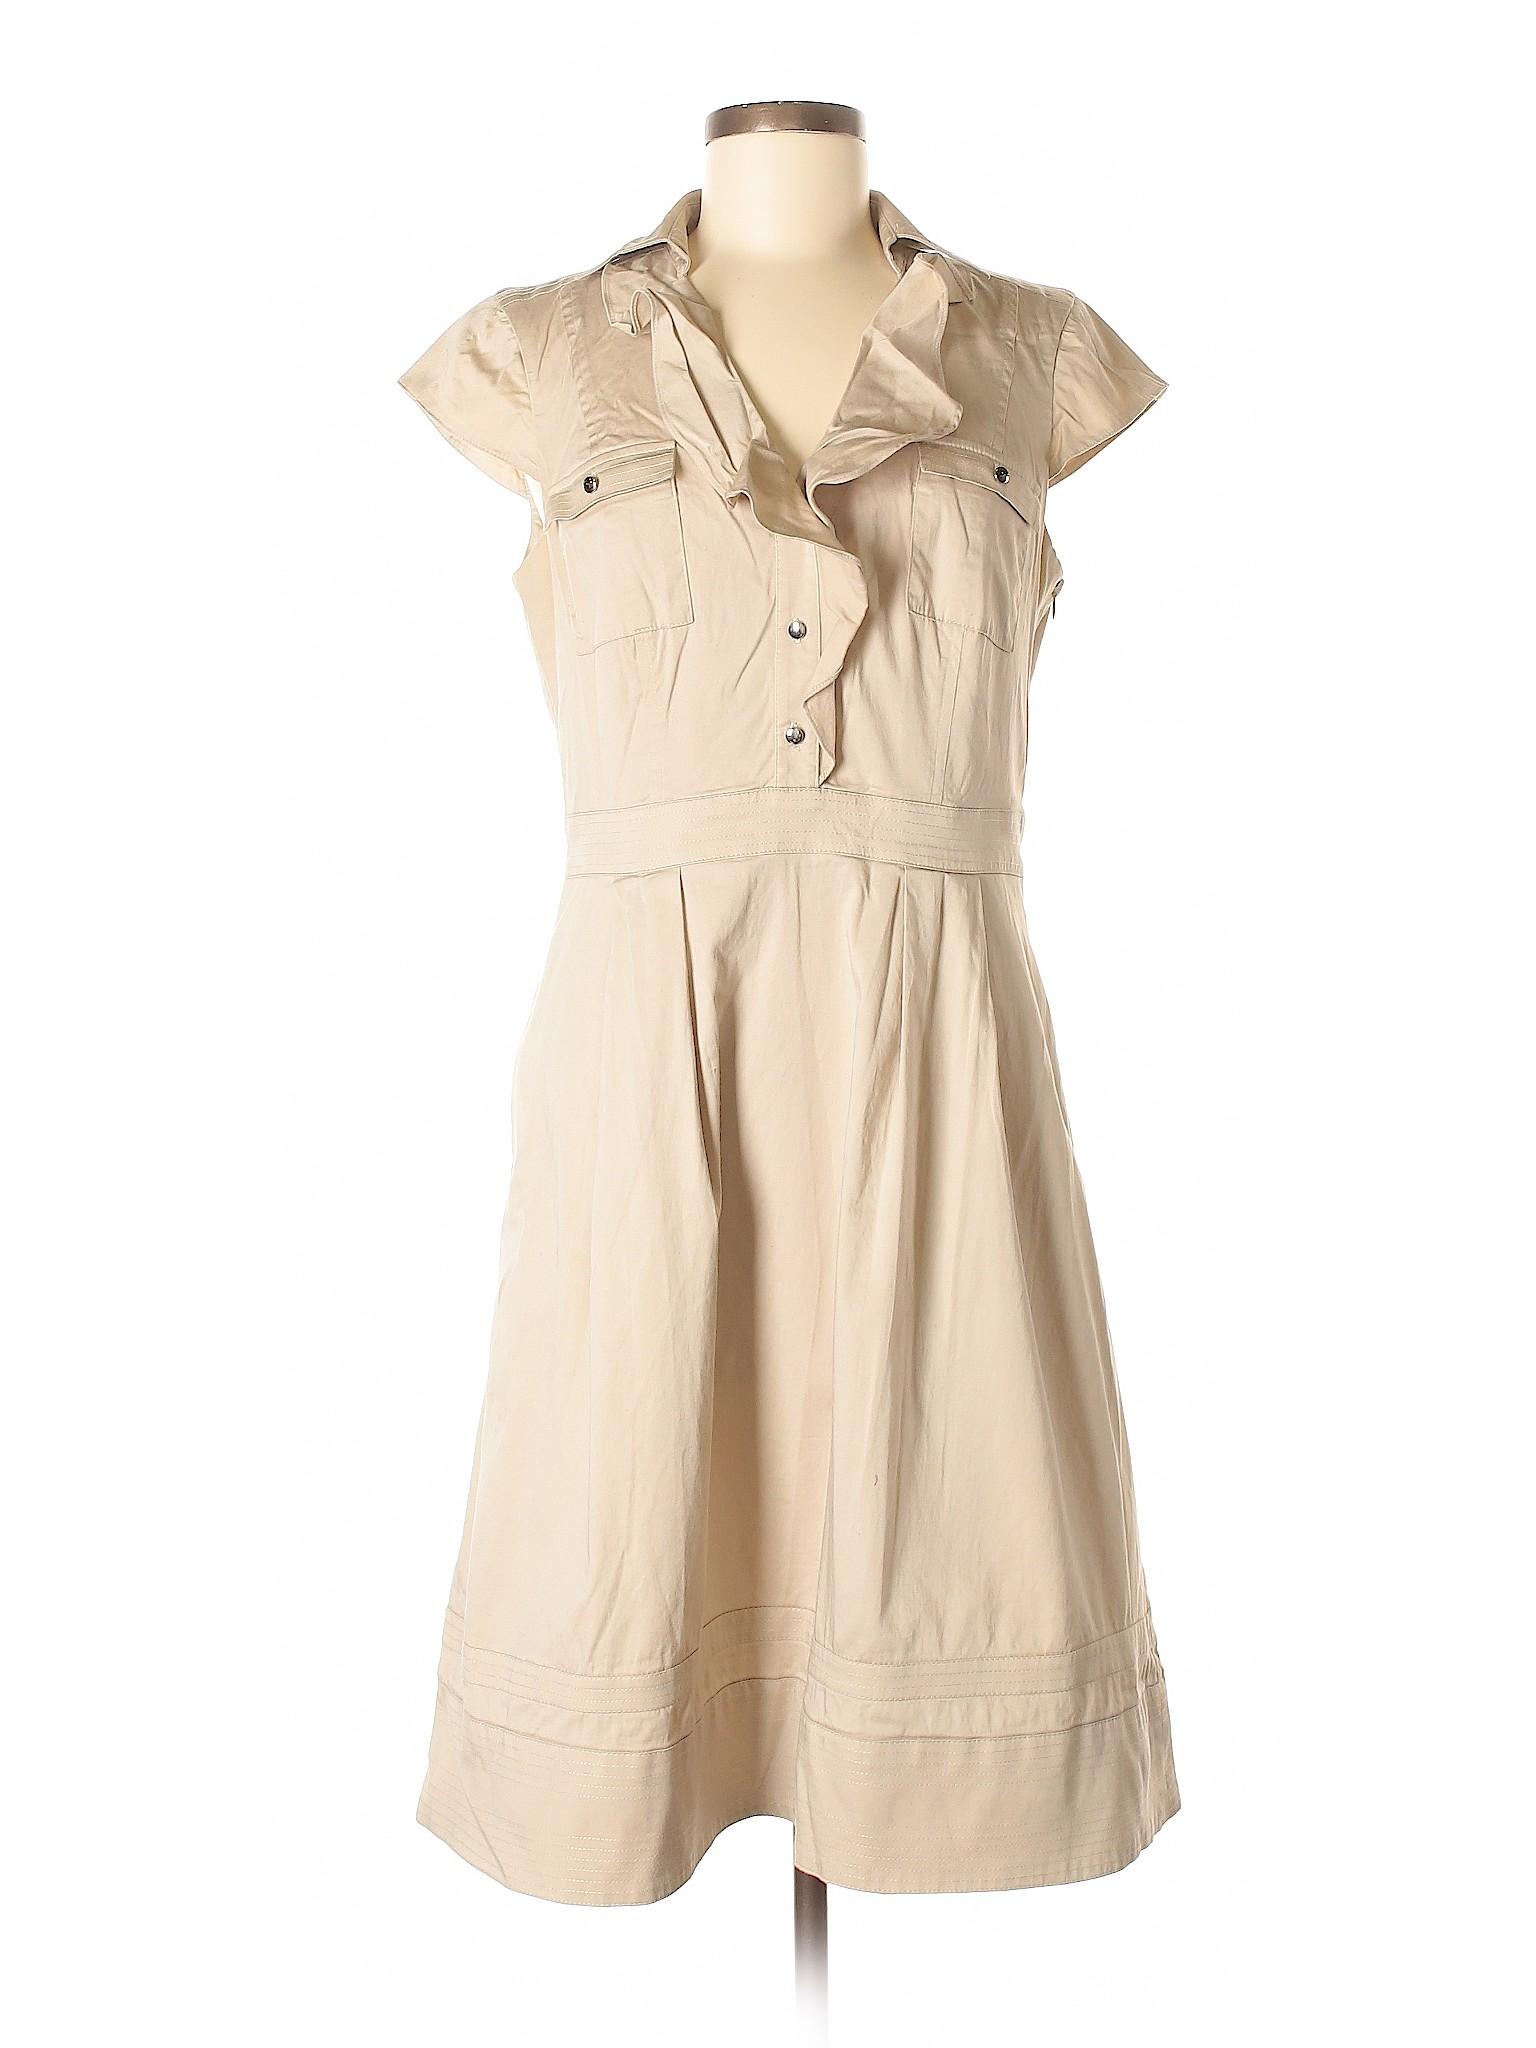 Black White Market Dress House Boutique Casual winter 6waO1nqt